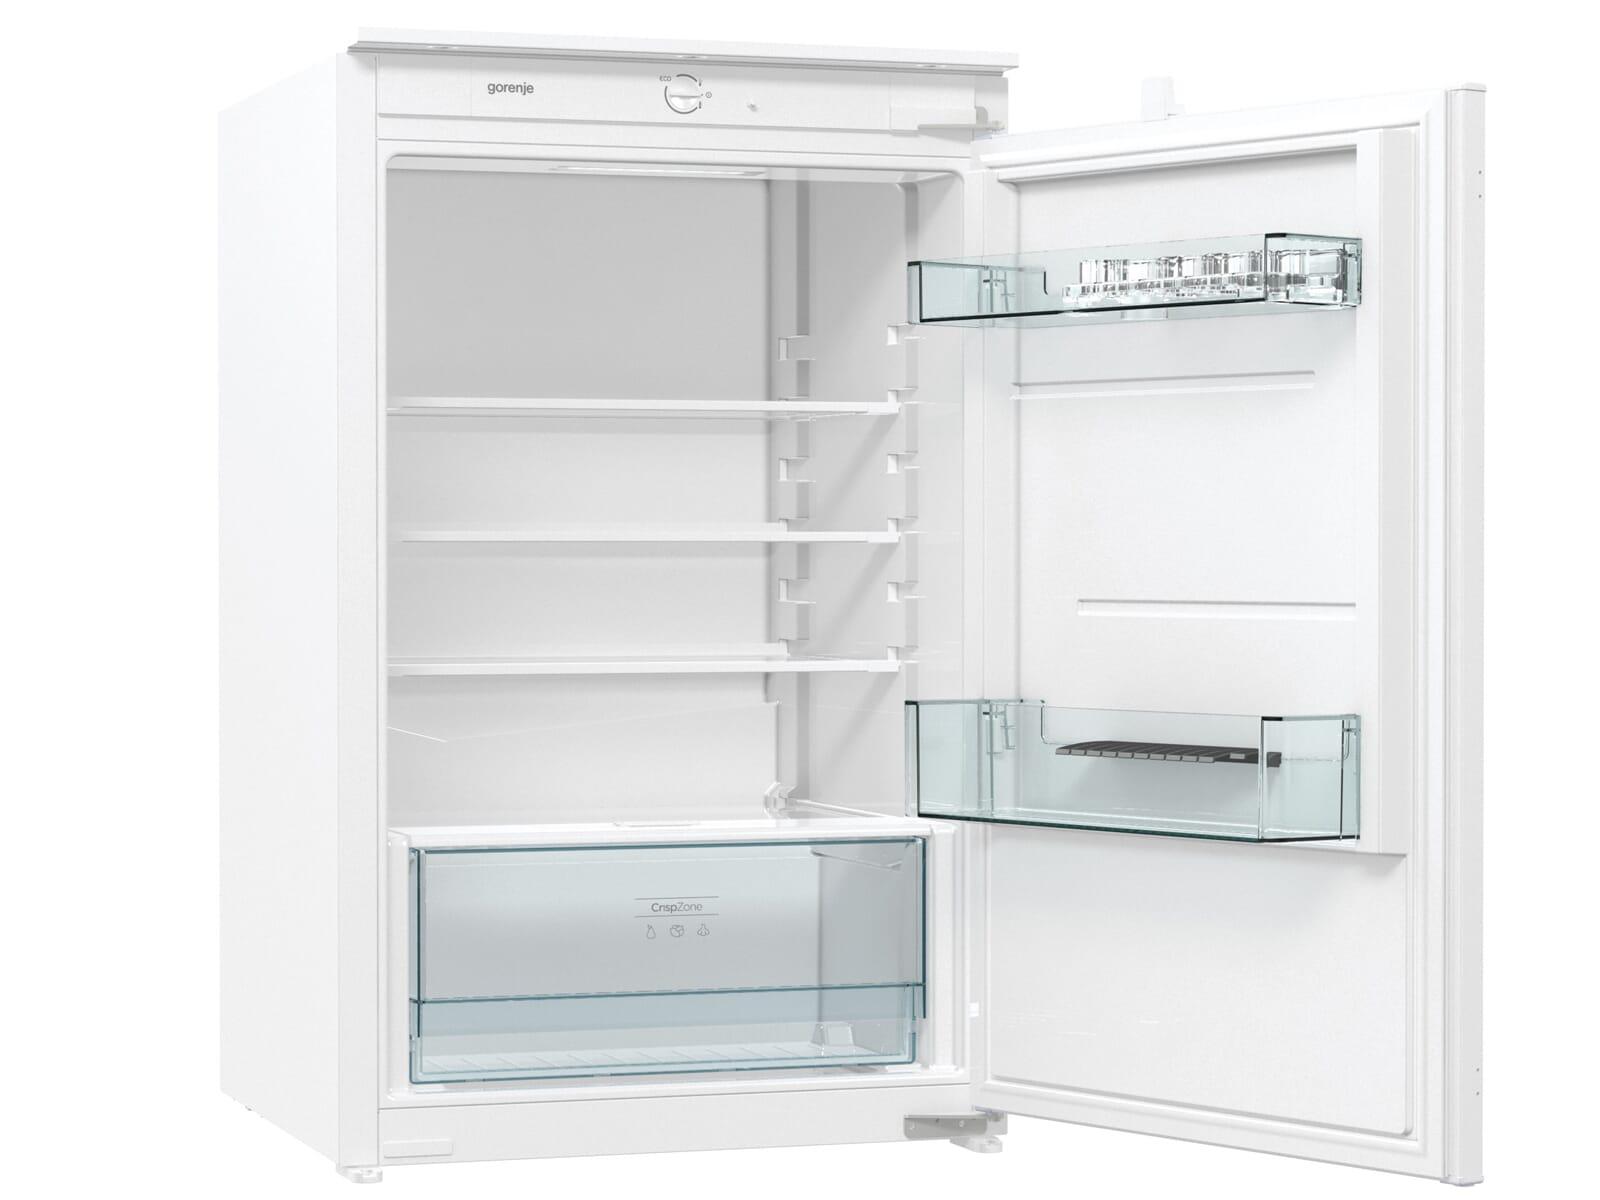 Gorenje RI 4091 E1 Einbaukühlschrank